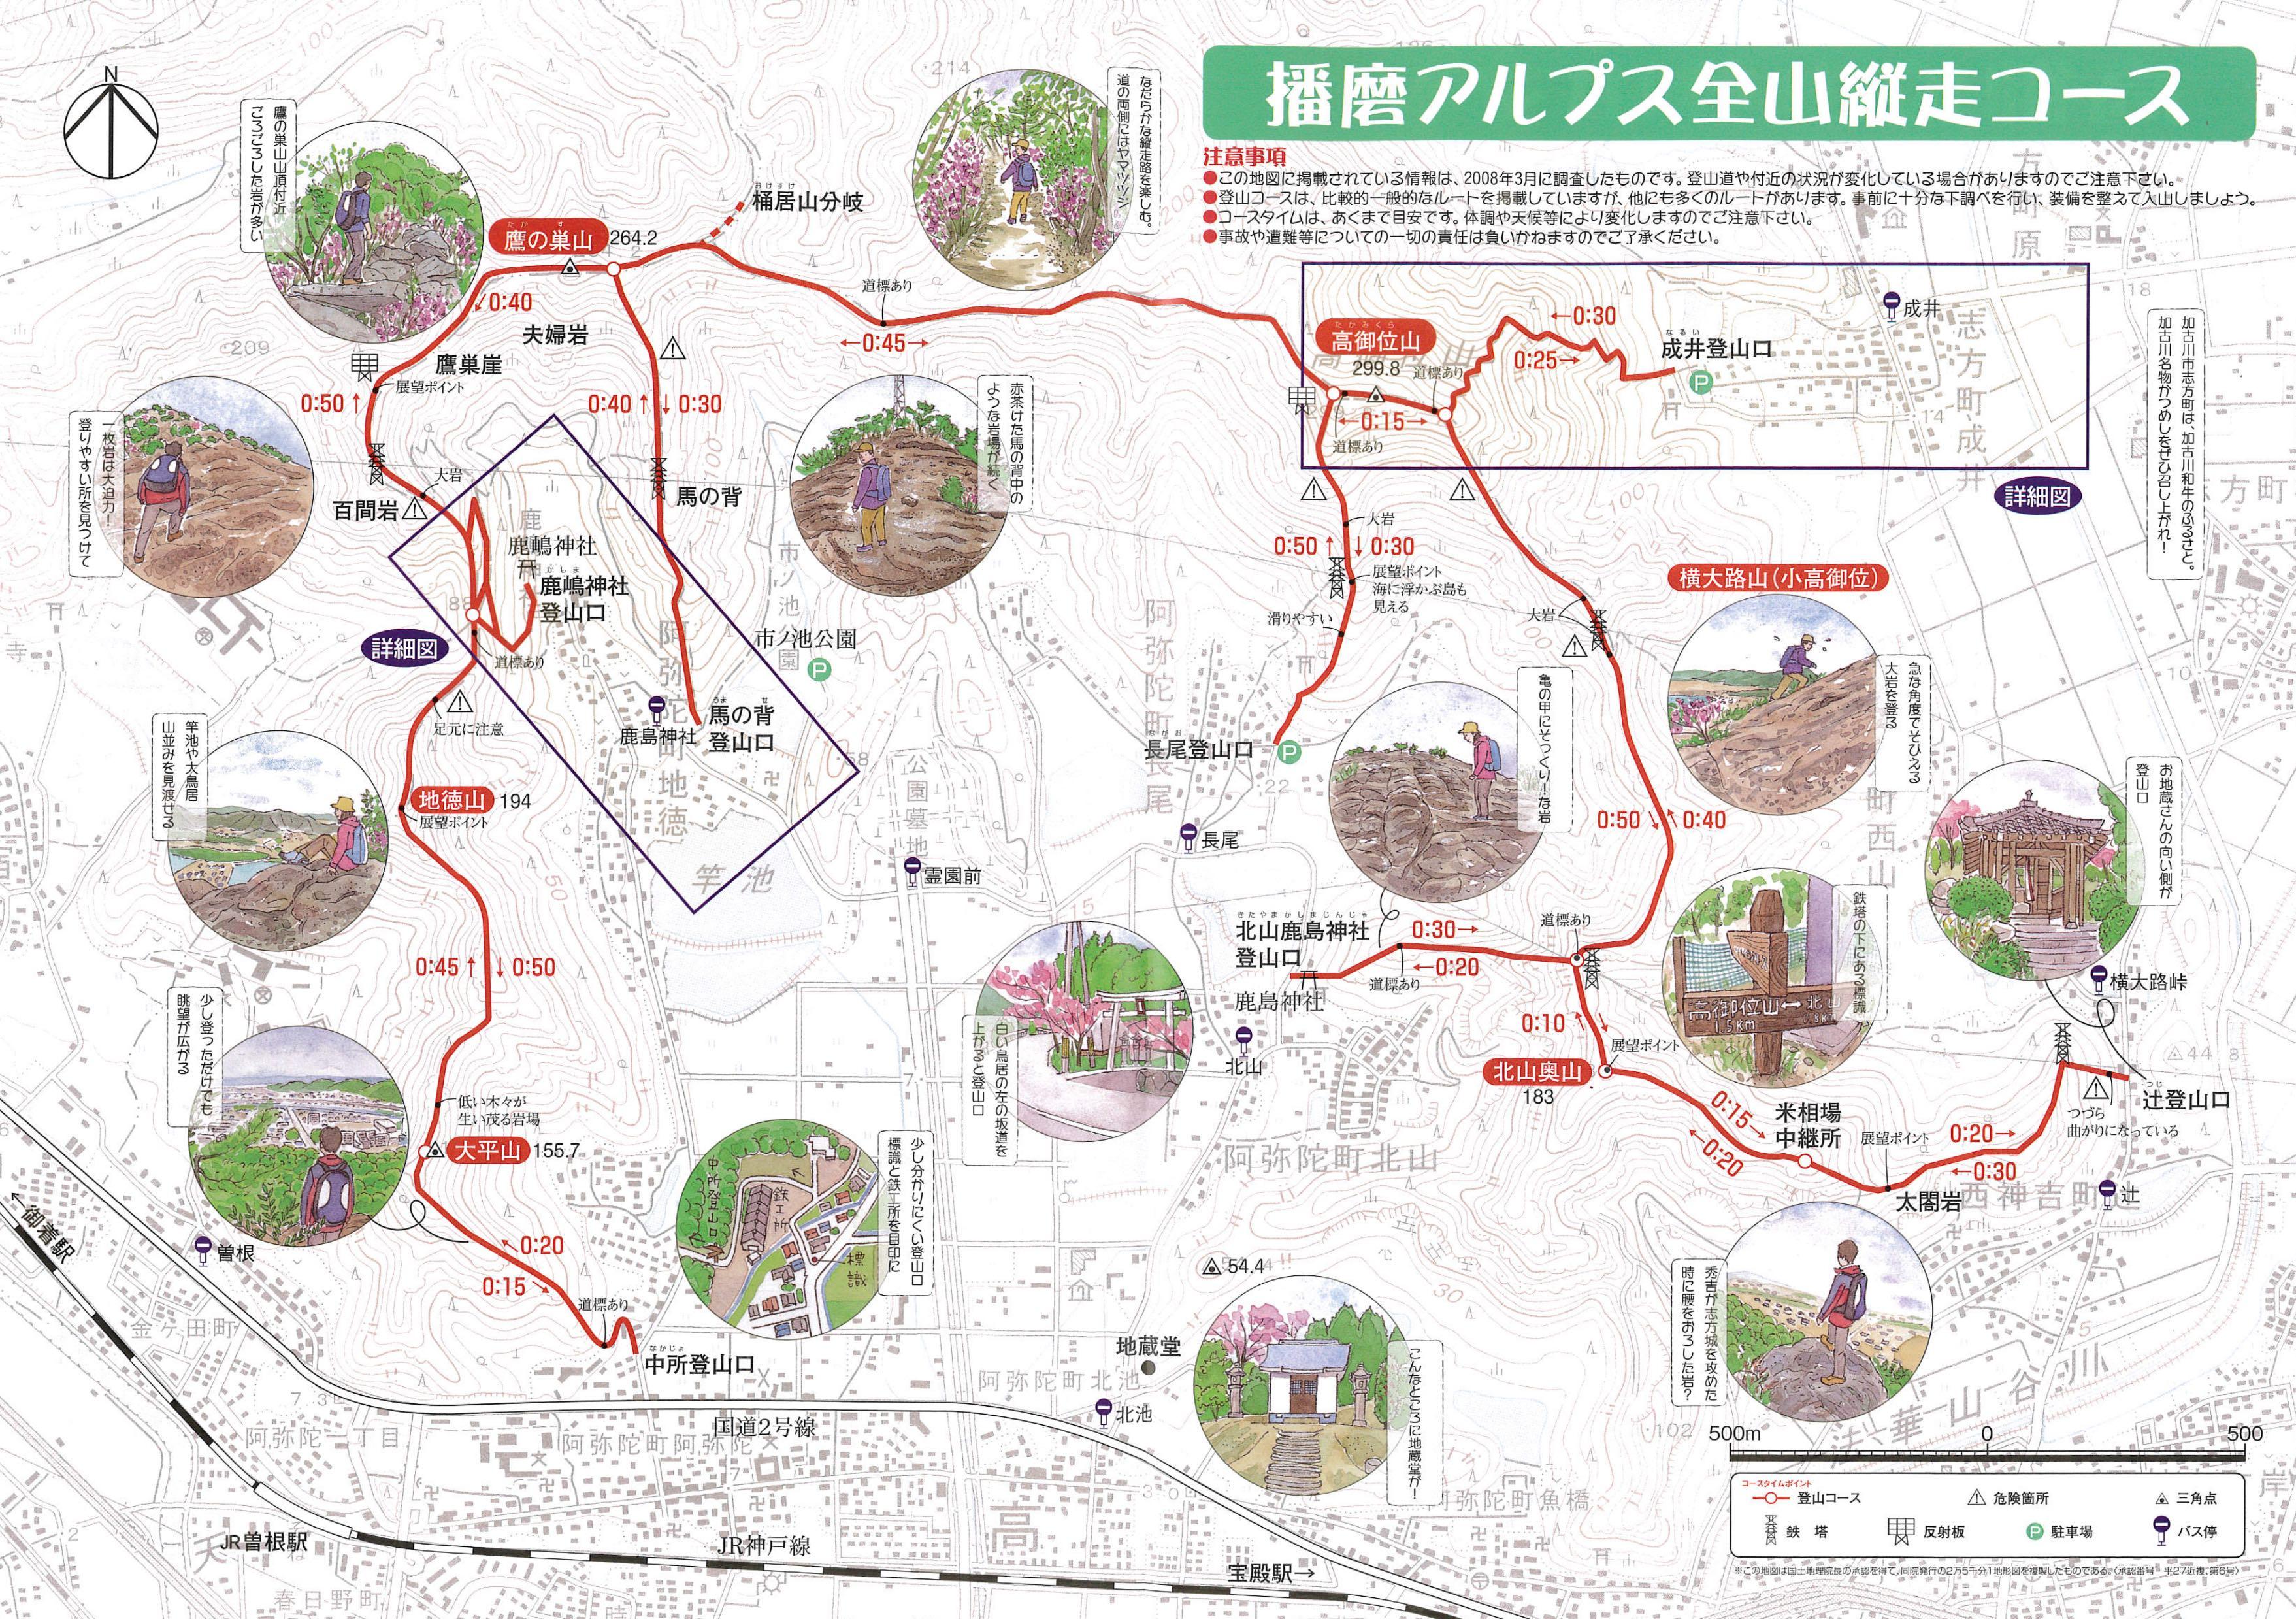 https://cdn-ak.f.st-hatena.com/images/fotolife/s/shioshiohida/20210207/20210207145703_original.jpg